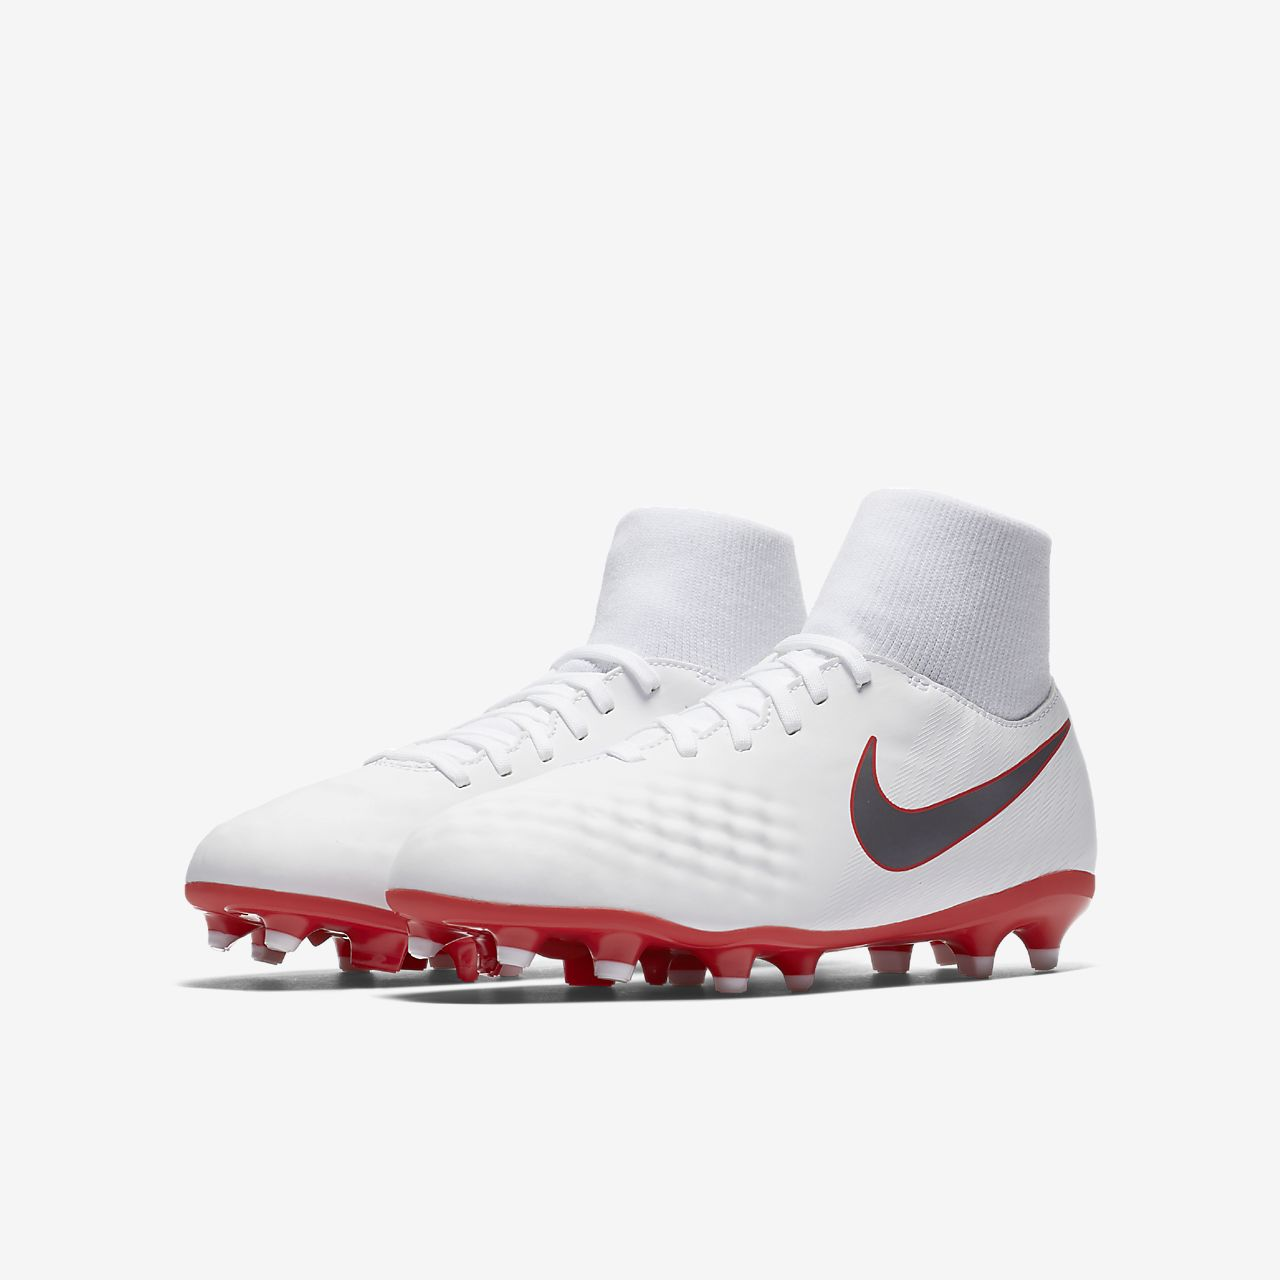 Nike - JUNIOR Magista 2 Club FG Just Do It 2018 Unisex En Línea rPdt0S